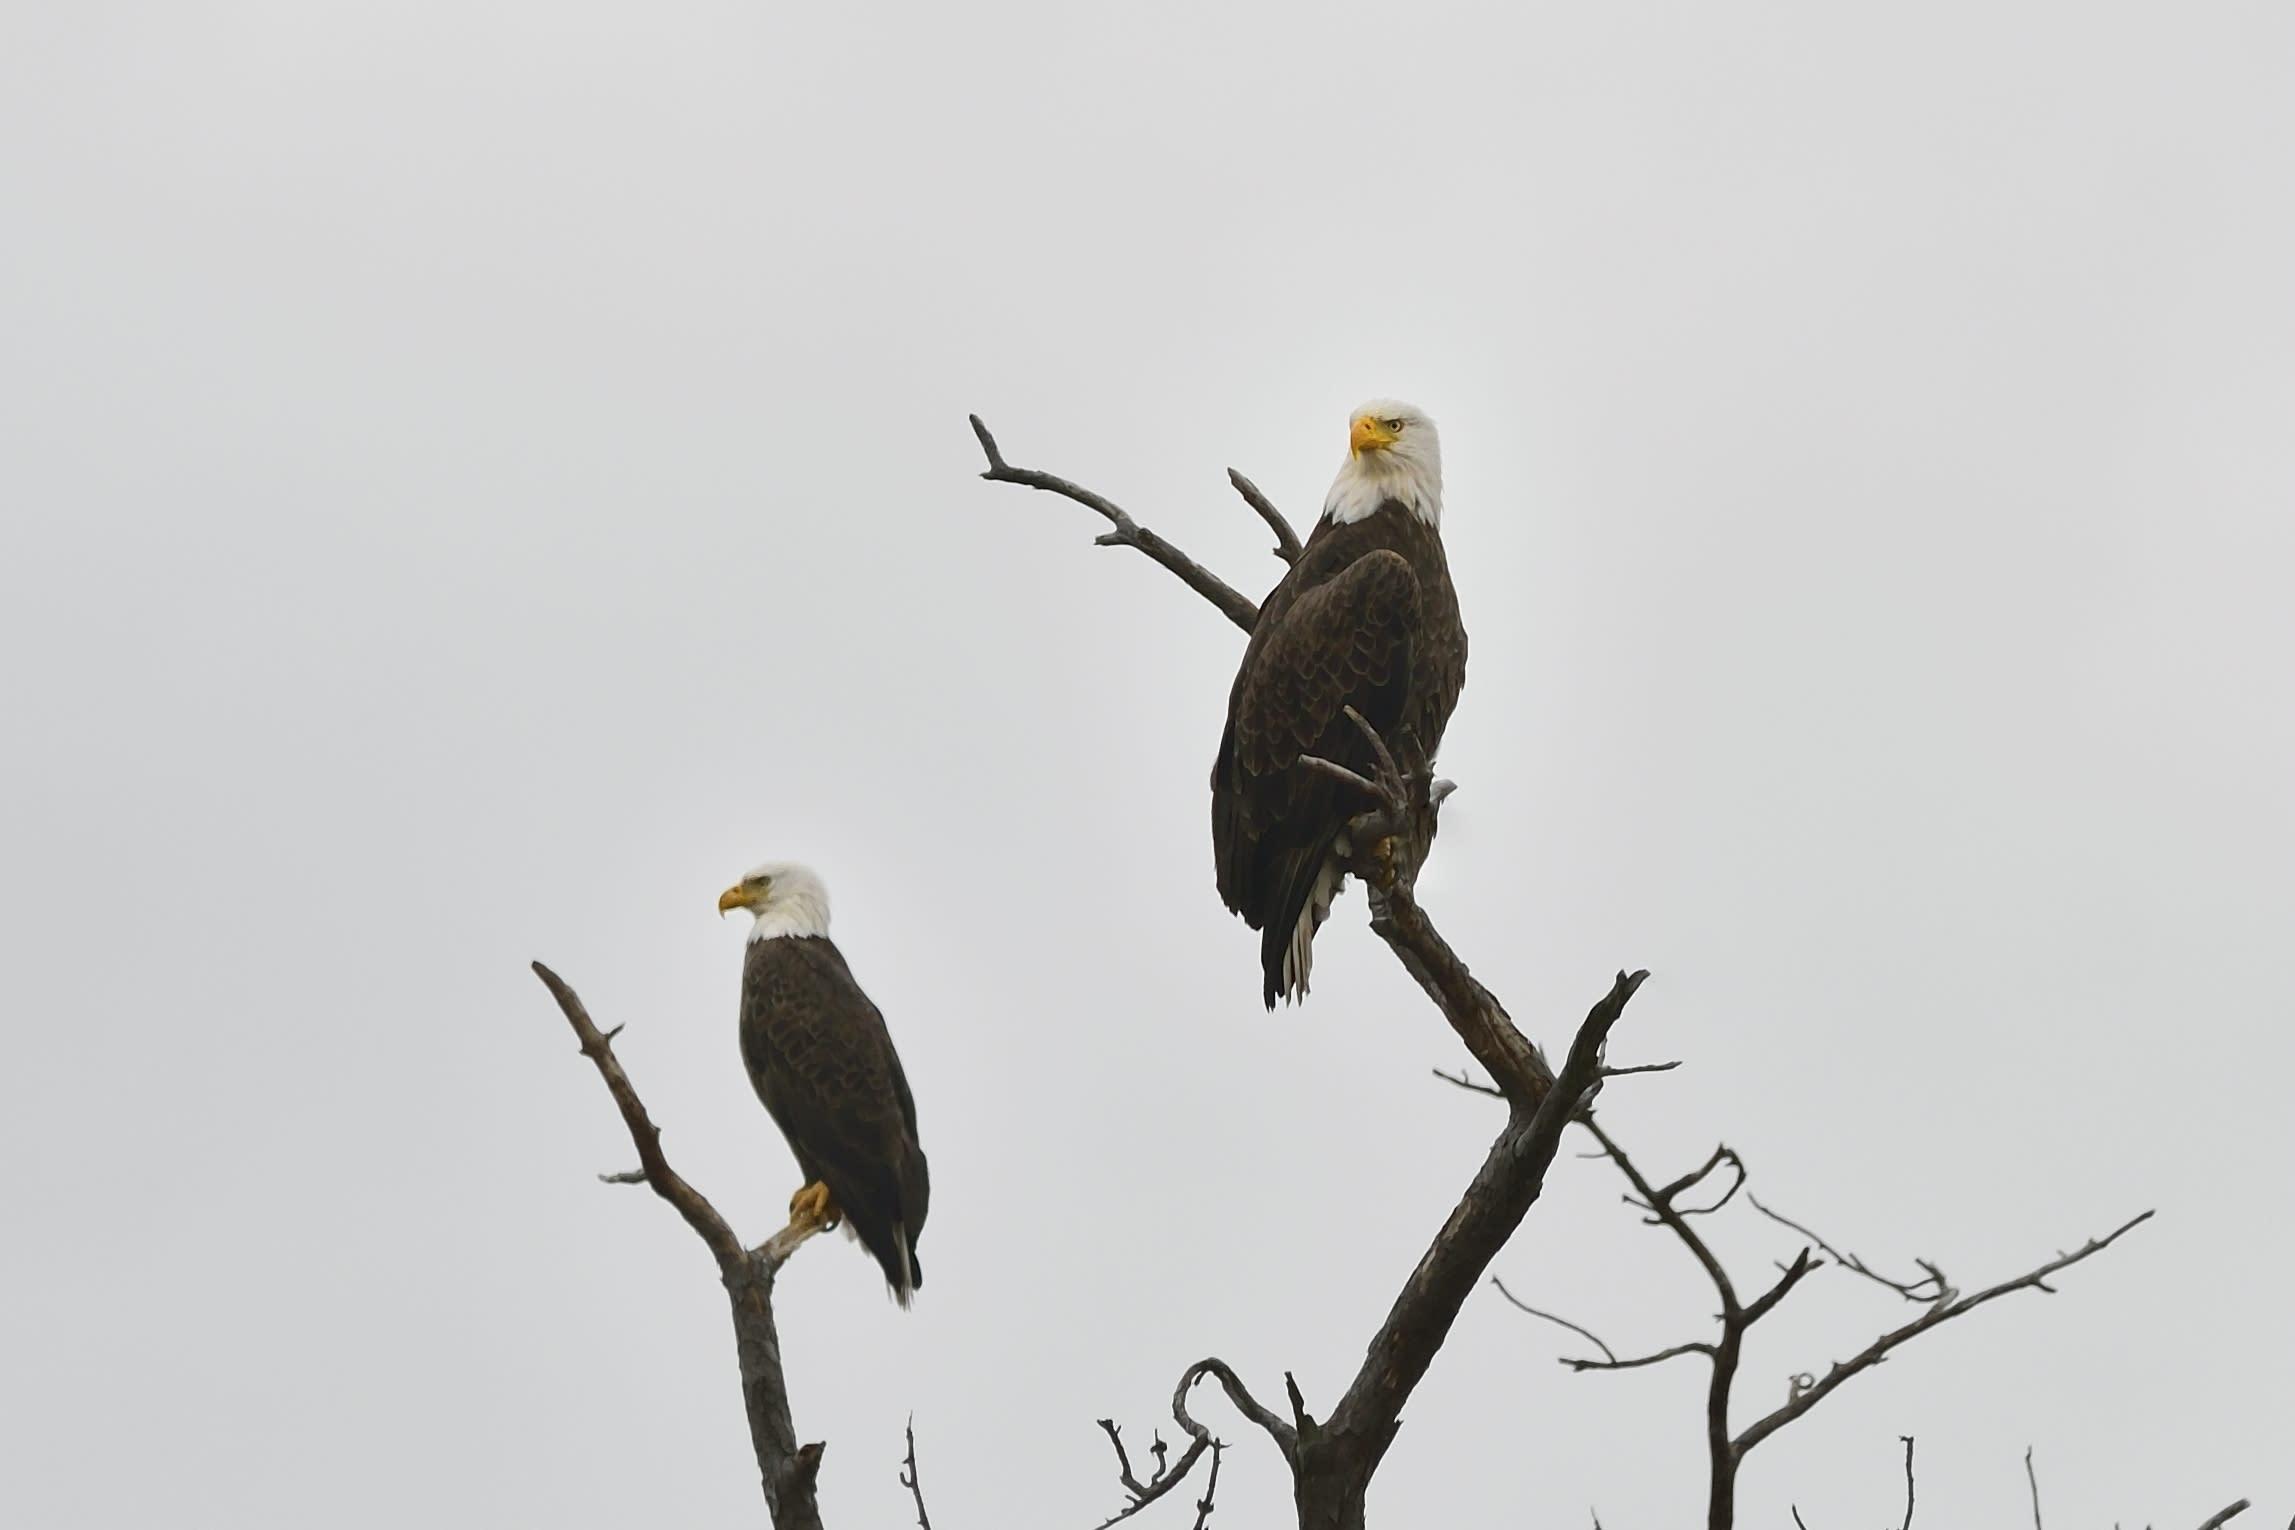 Eagles in Hudson Valley